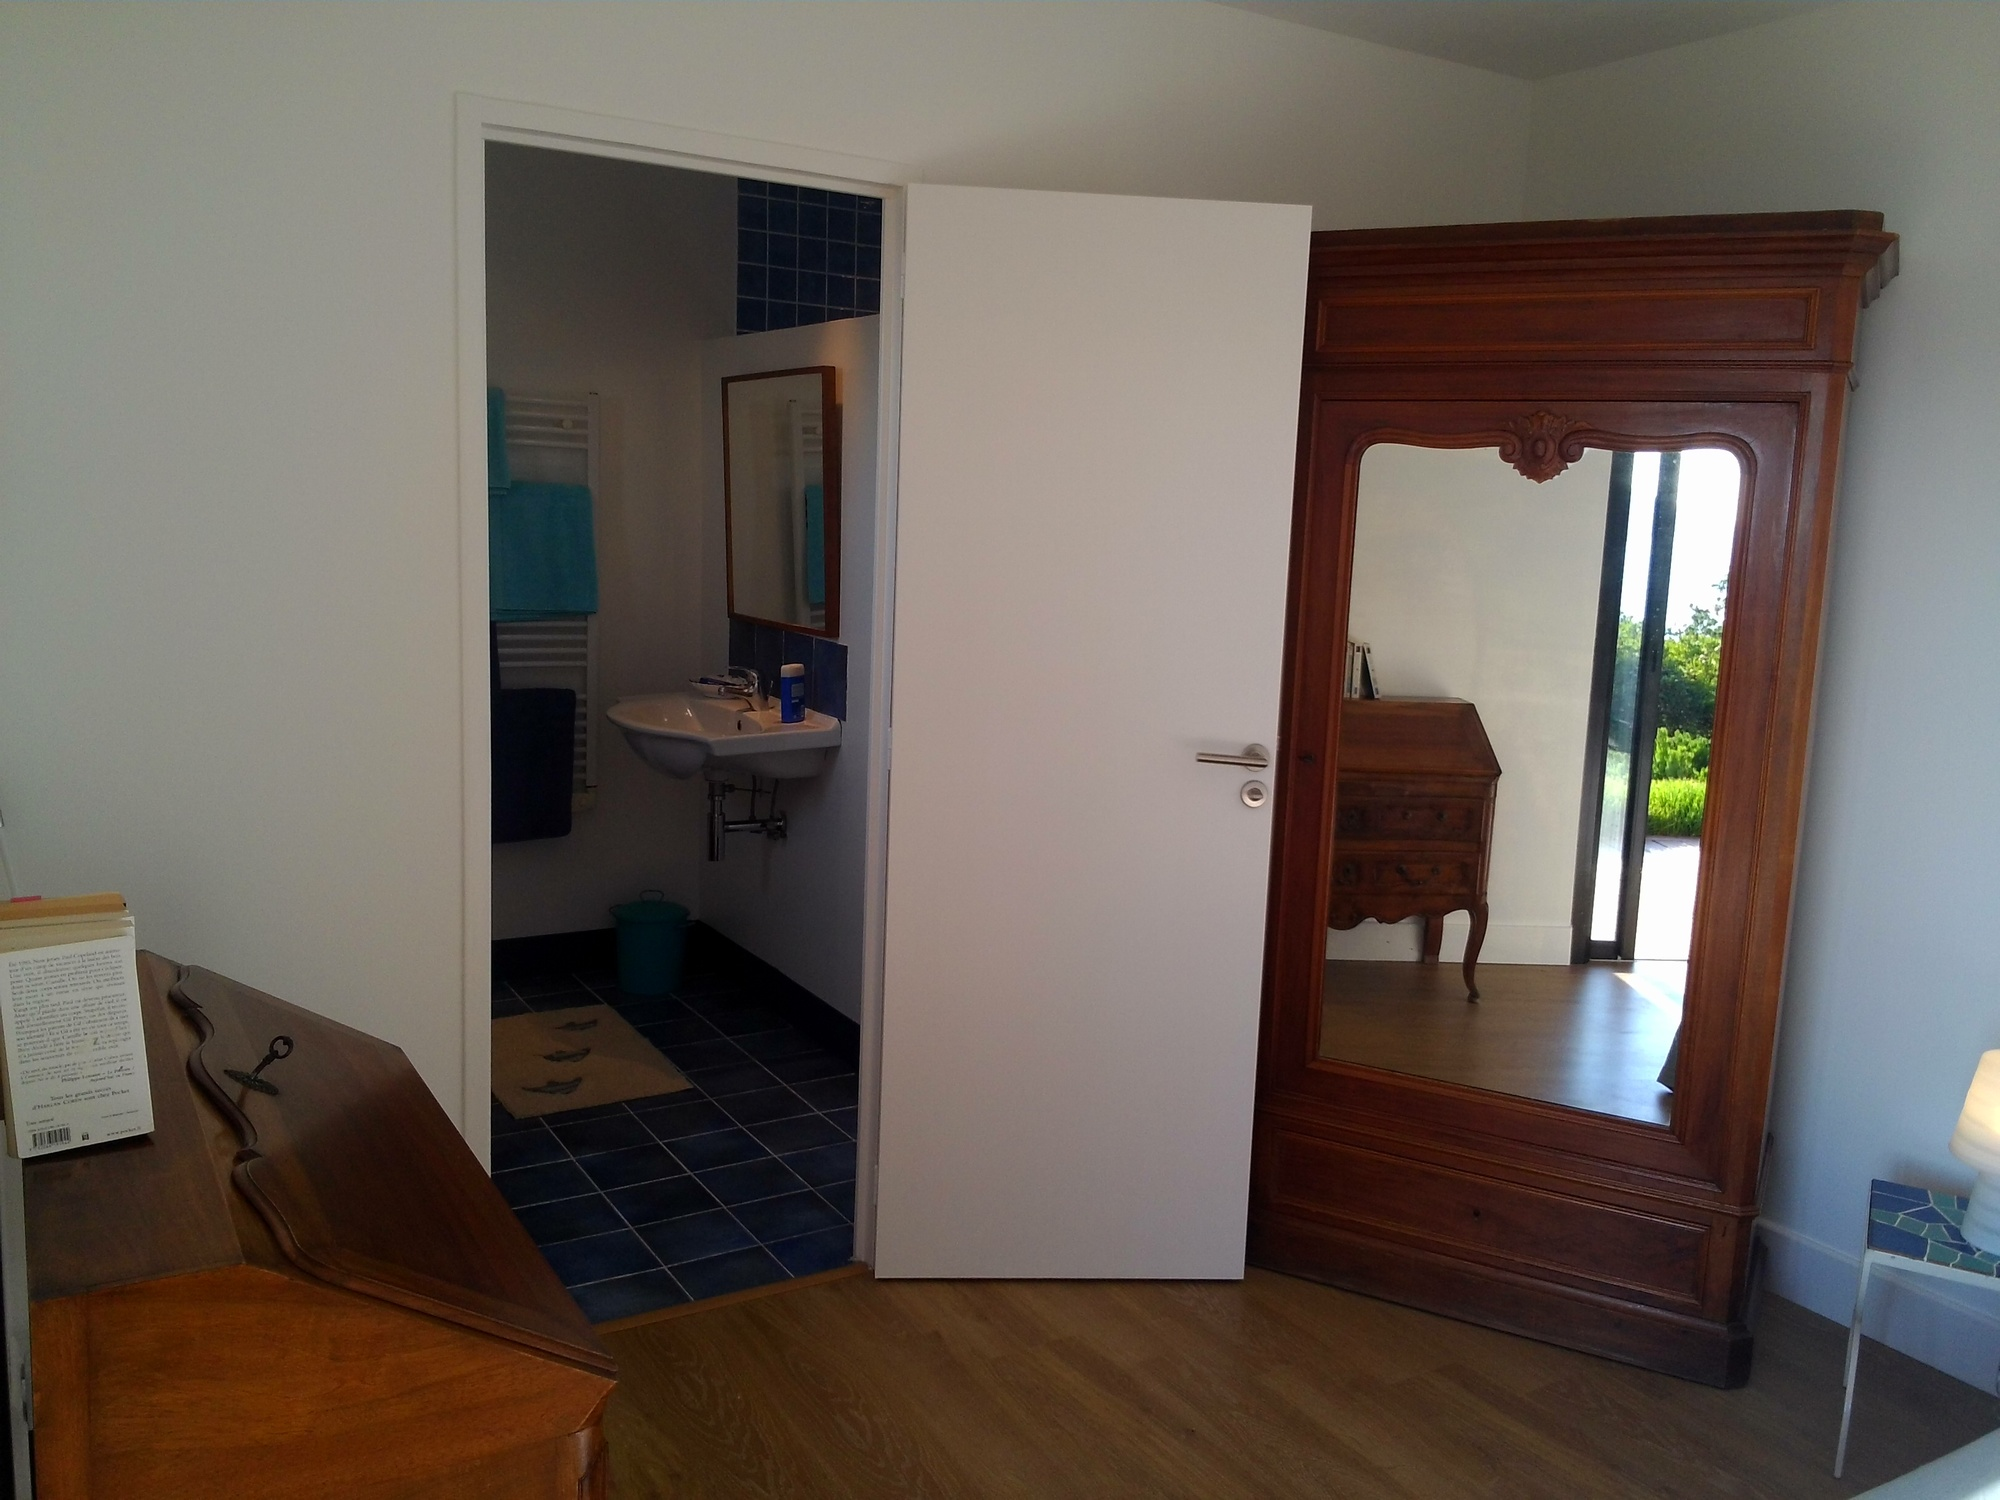 villa mirabel hy res chambre d 39 h tes hy res tourisme. Black Bedroom Furniture Sets. Home Design Ideas